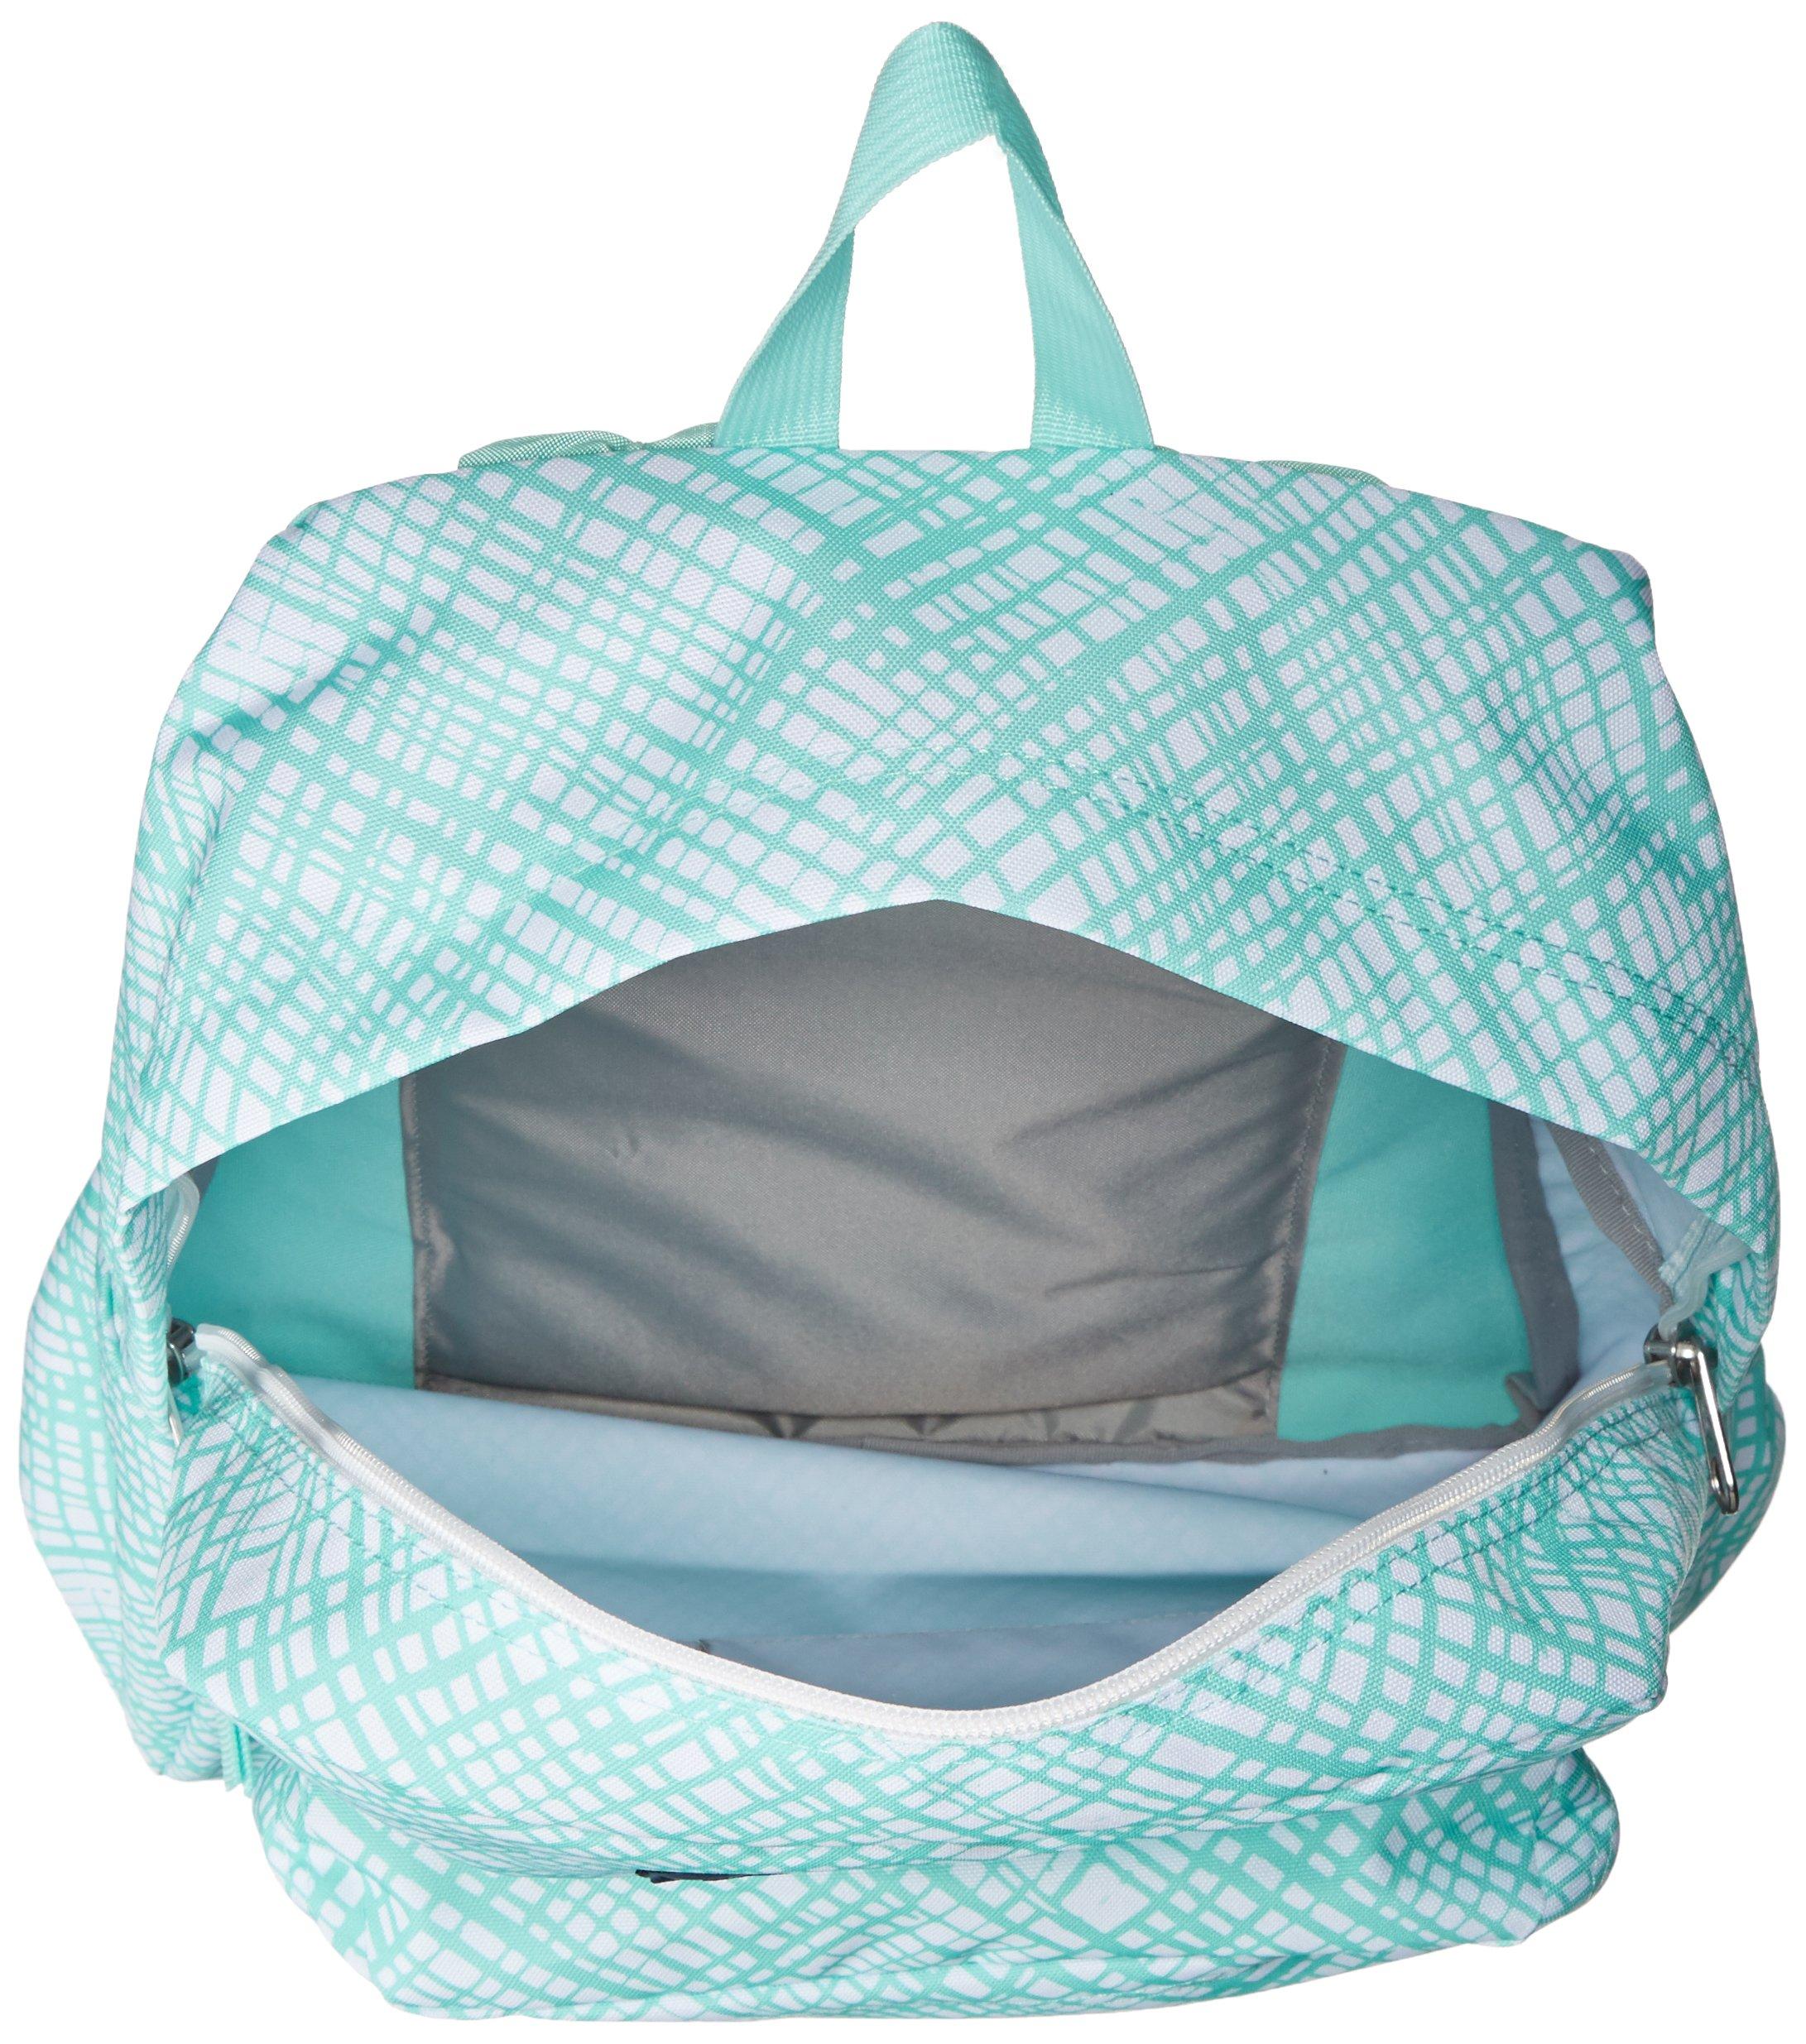 JanSport Womens Classic Mainstream Superbreak Backpack - Aqua Dash Jagged Plaid / 16.7'' H X 13'' W X 8.5'' D by JanSport (Image #3)